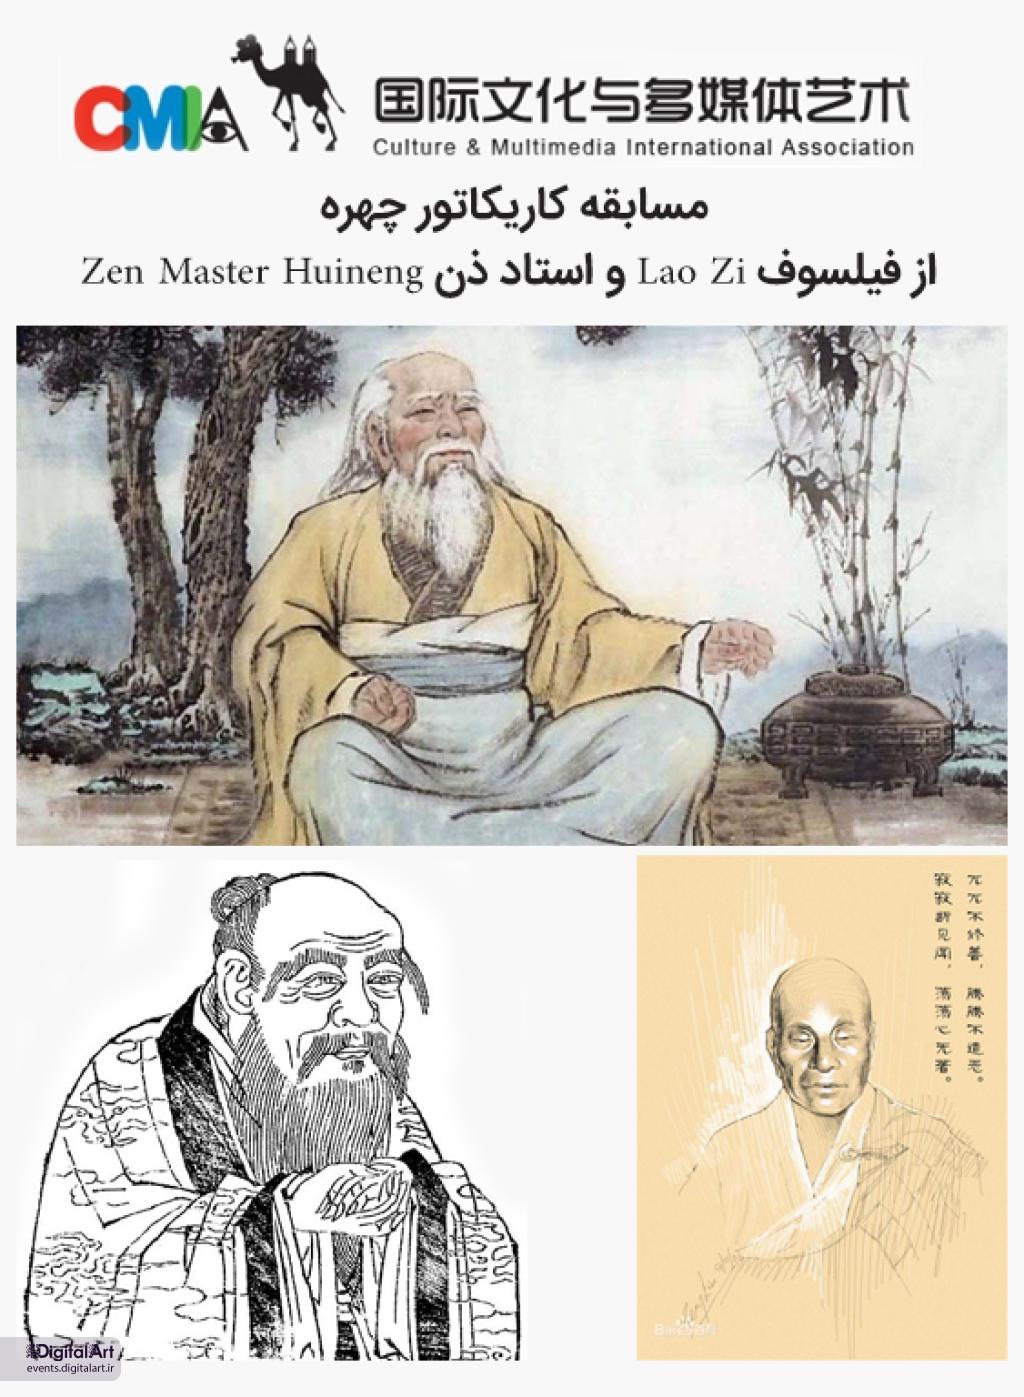 مسابقه کاریکاتور چهره از فیلسوف Lao Zi و استاد ذن Zen Master Huineng